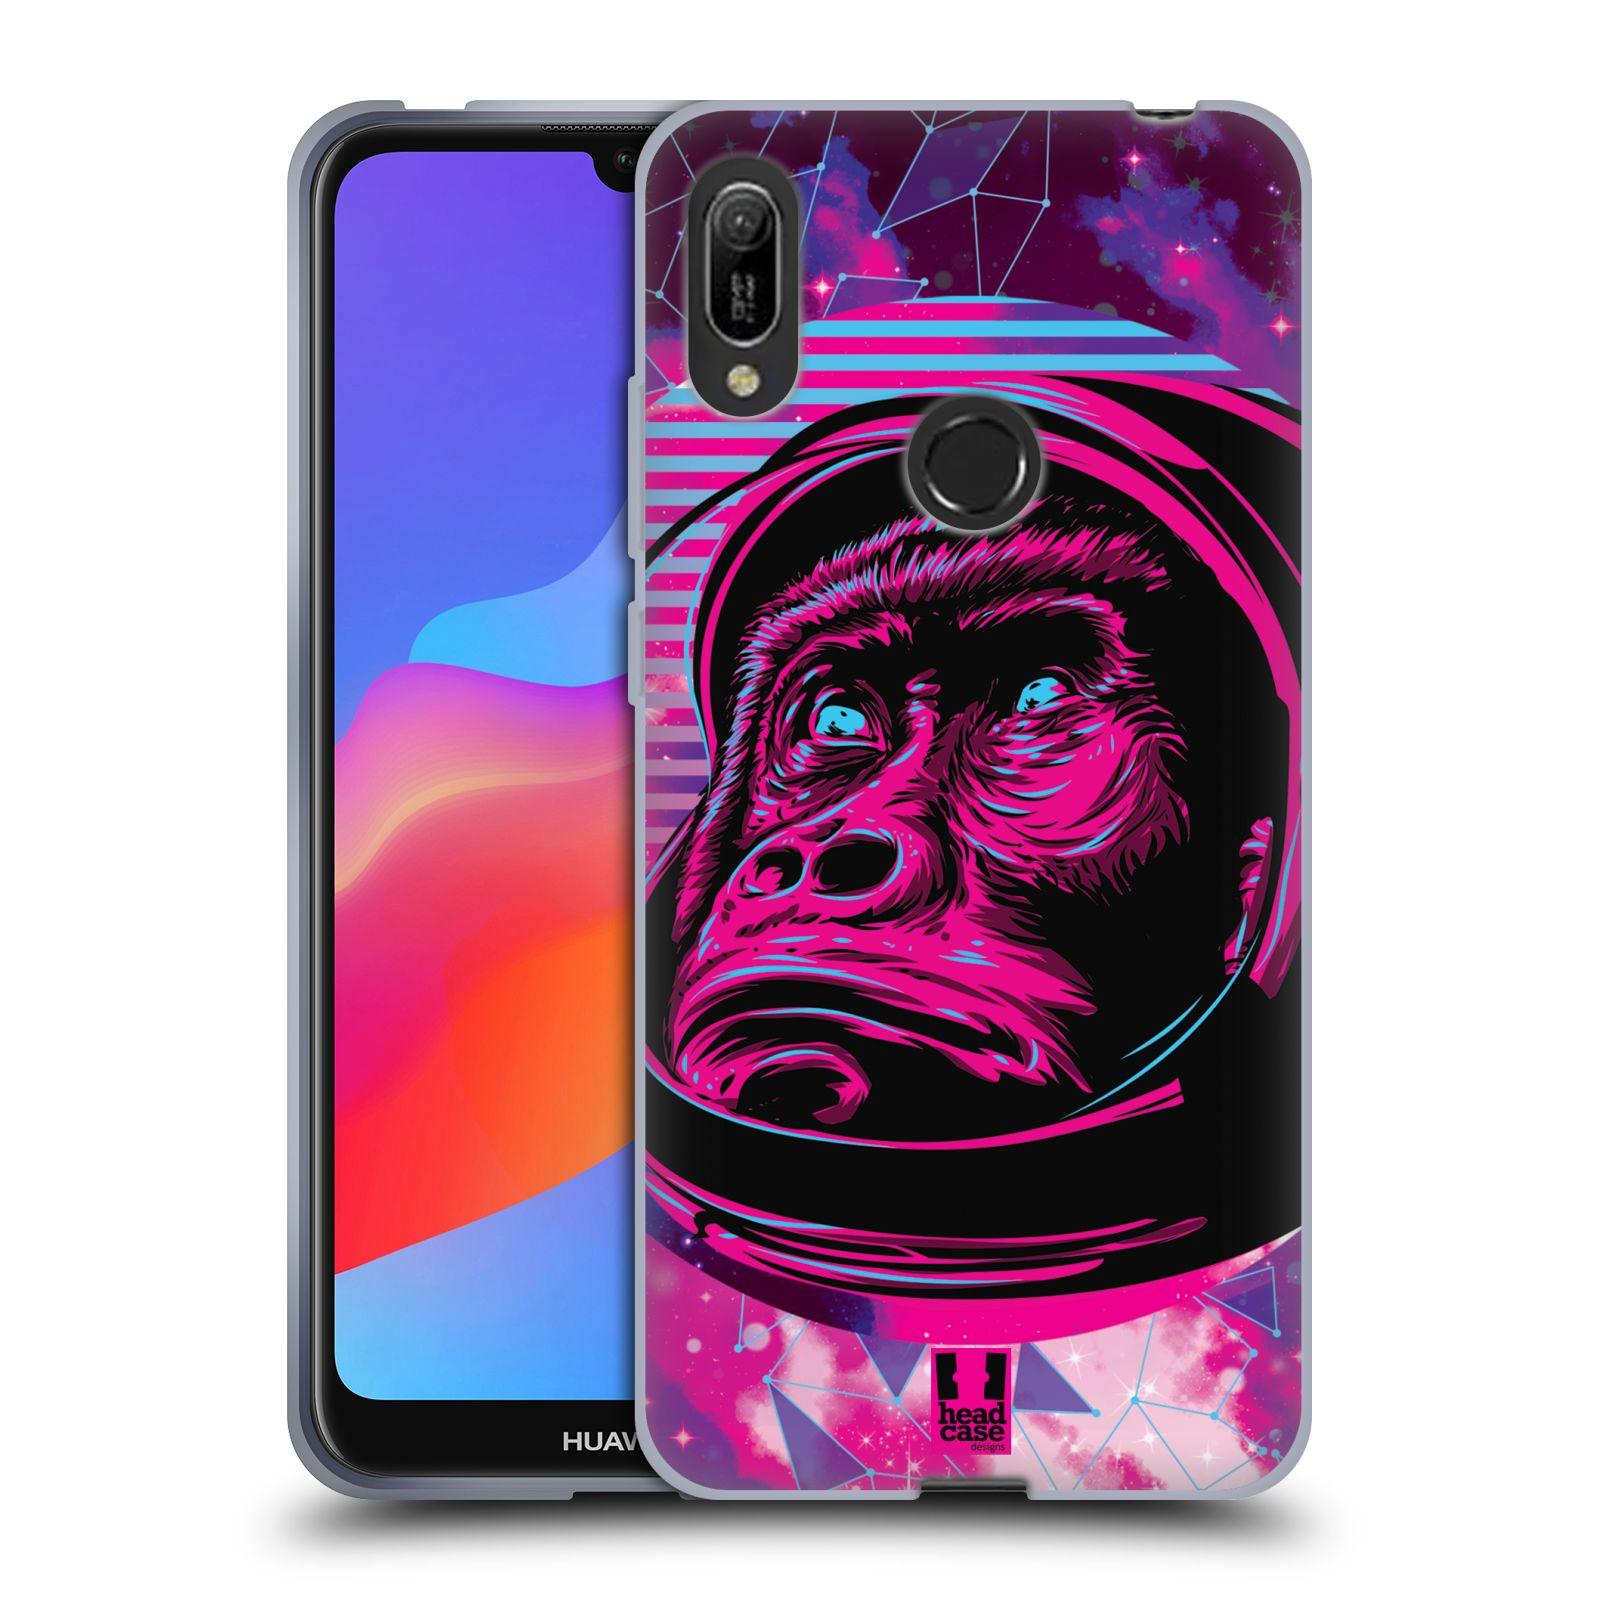 Silikonové pouzdro na mobil Huawei Y6 (2019) - Head Case - Gorila ve skafandru